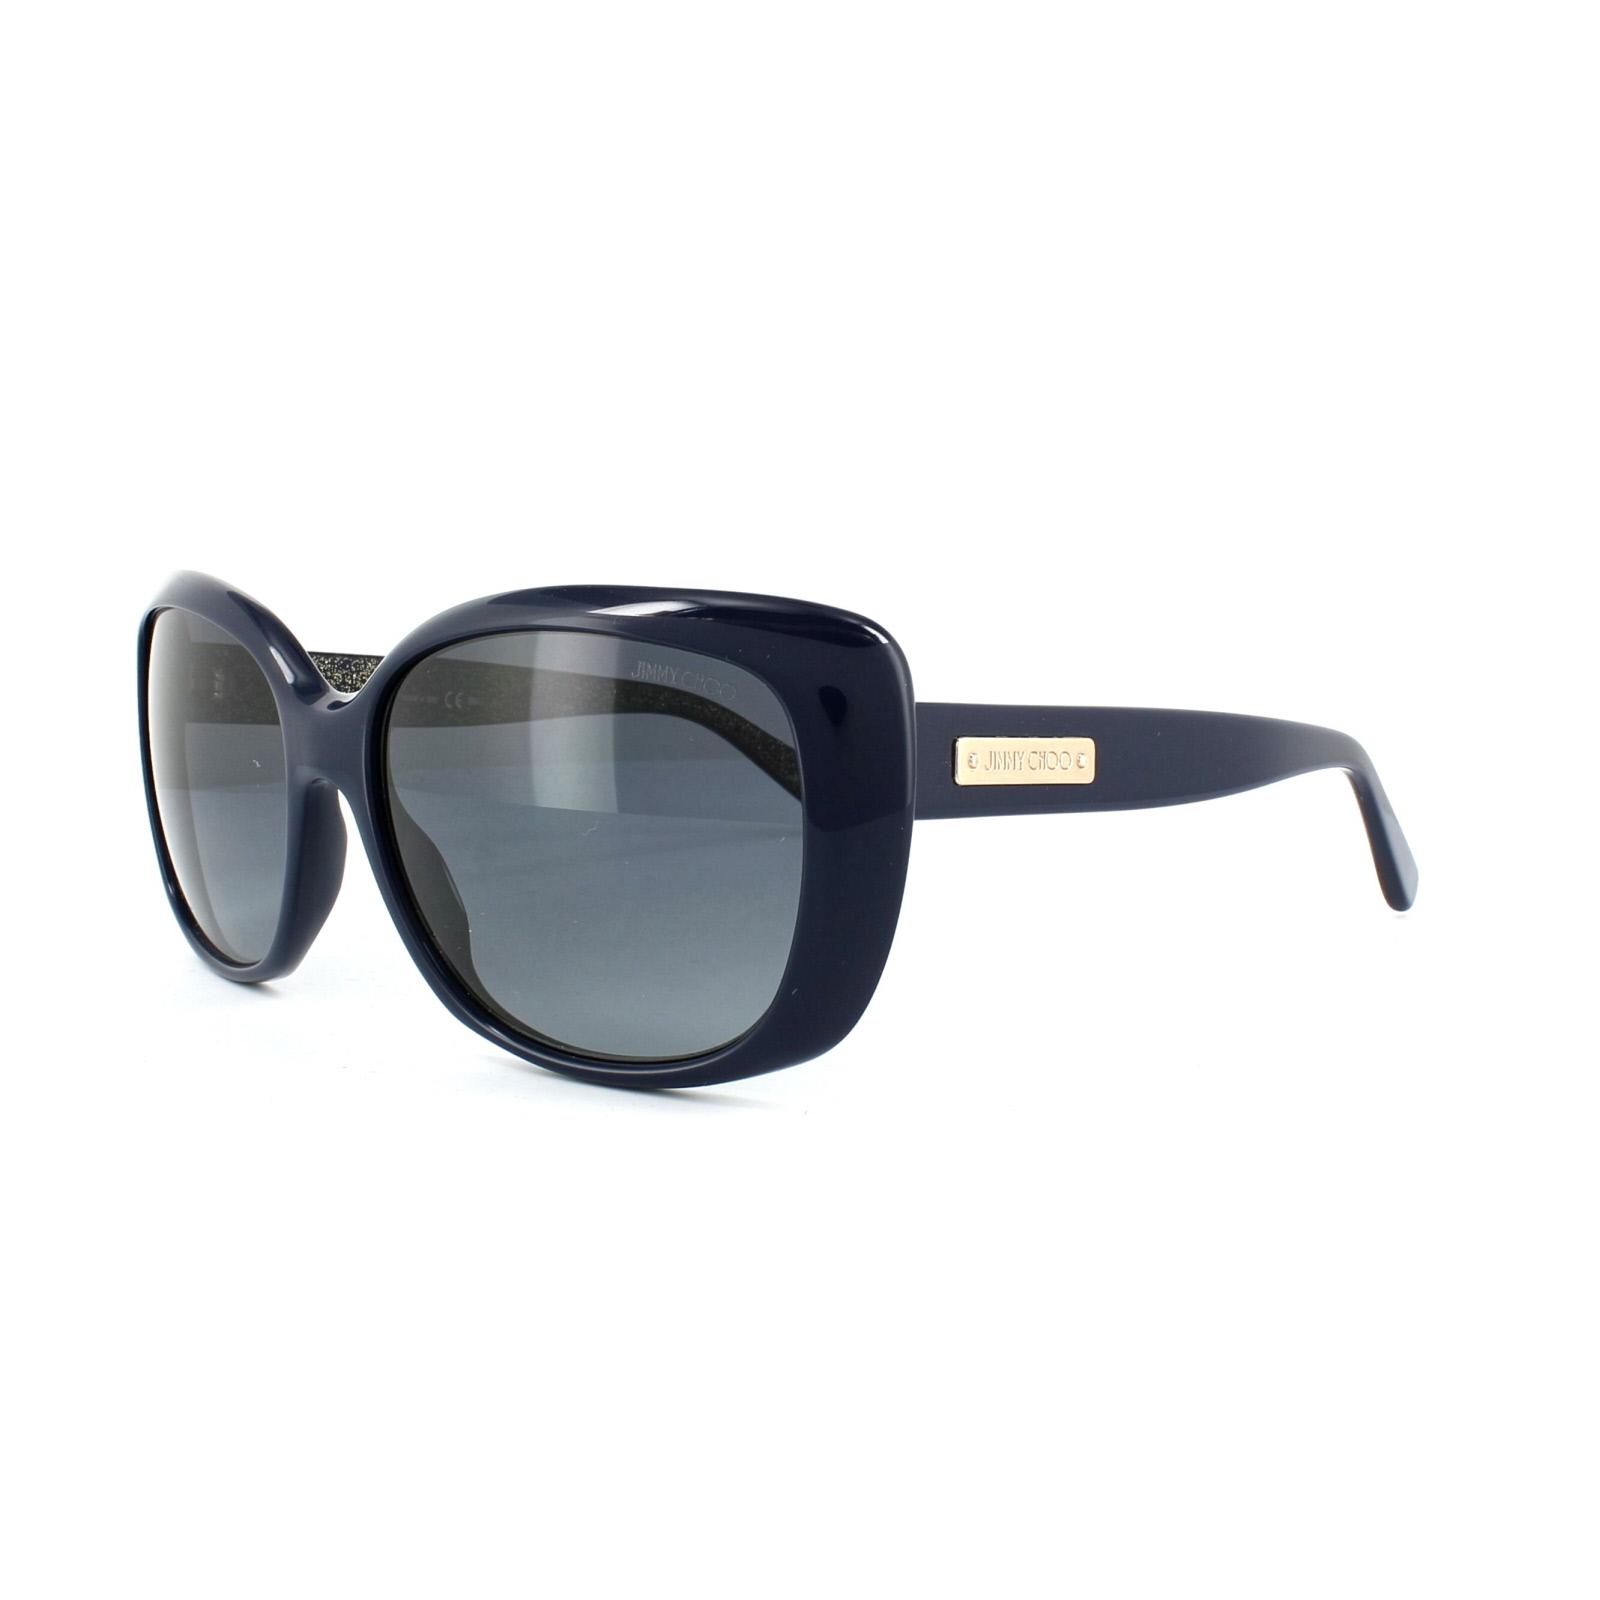 bed7508b1529 Sentinel Jimmy Choo Sunglasses Kalia EN9 HD Blue Glitter Gold Grey Gradient